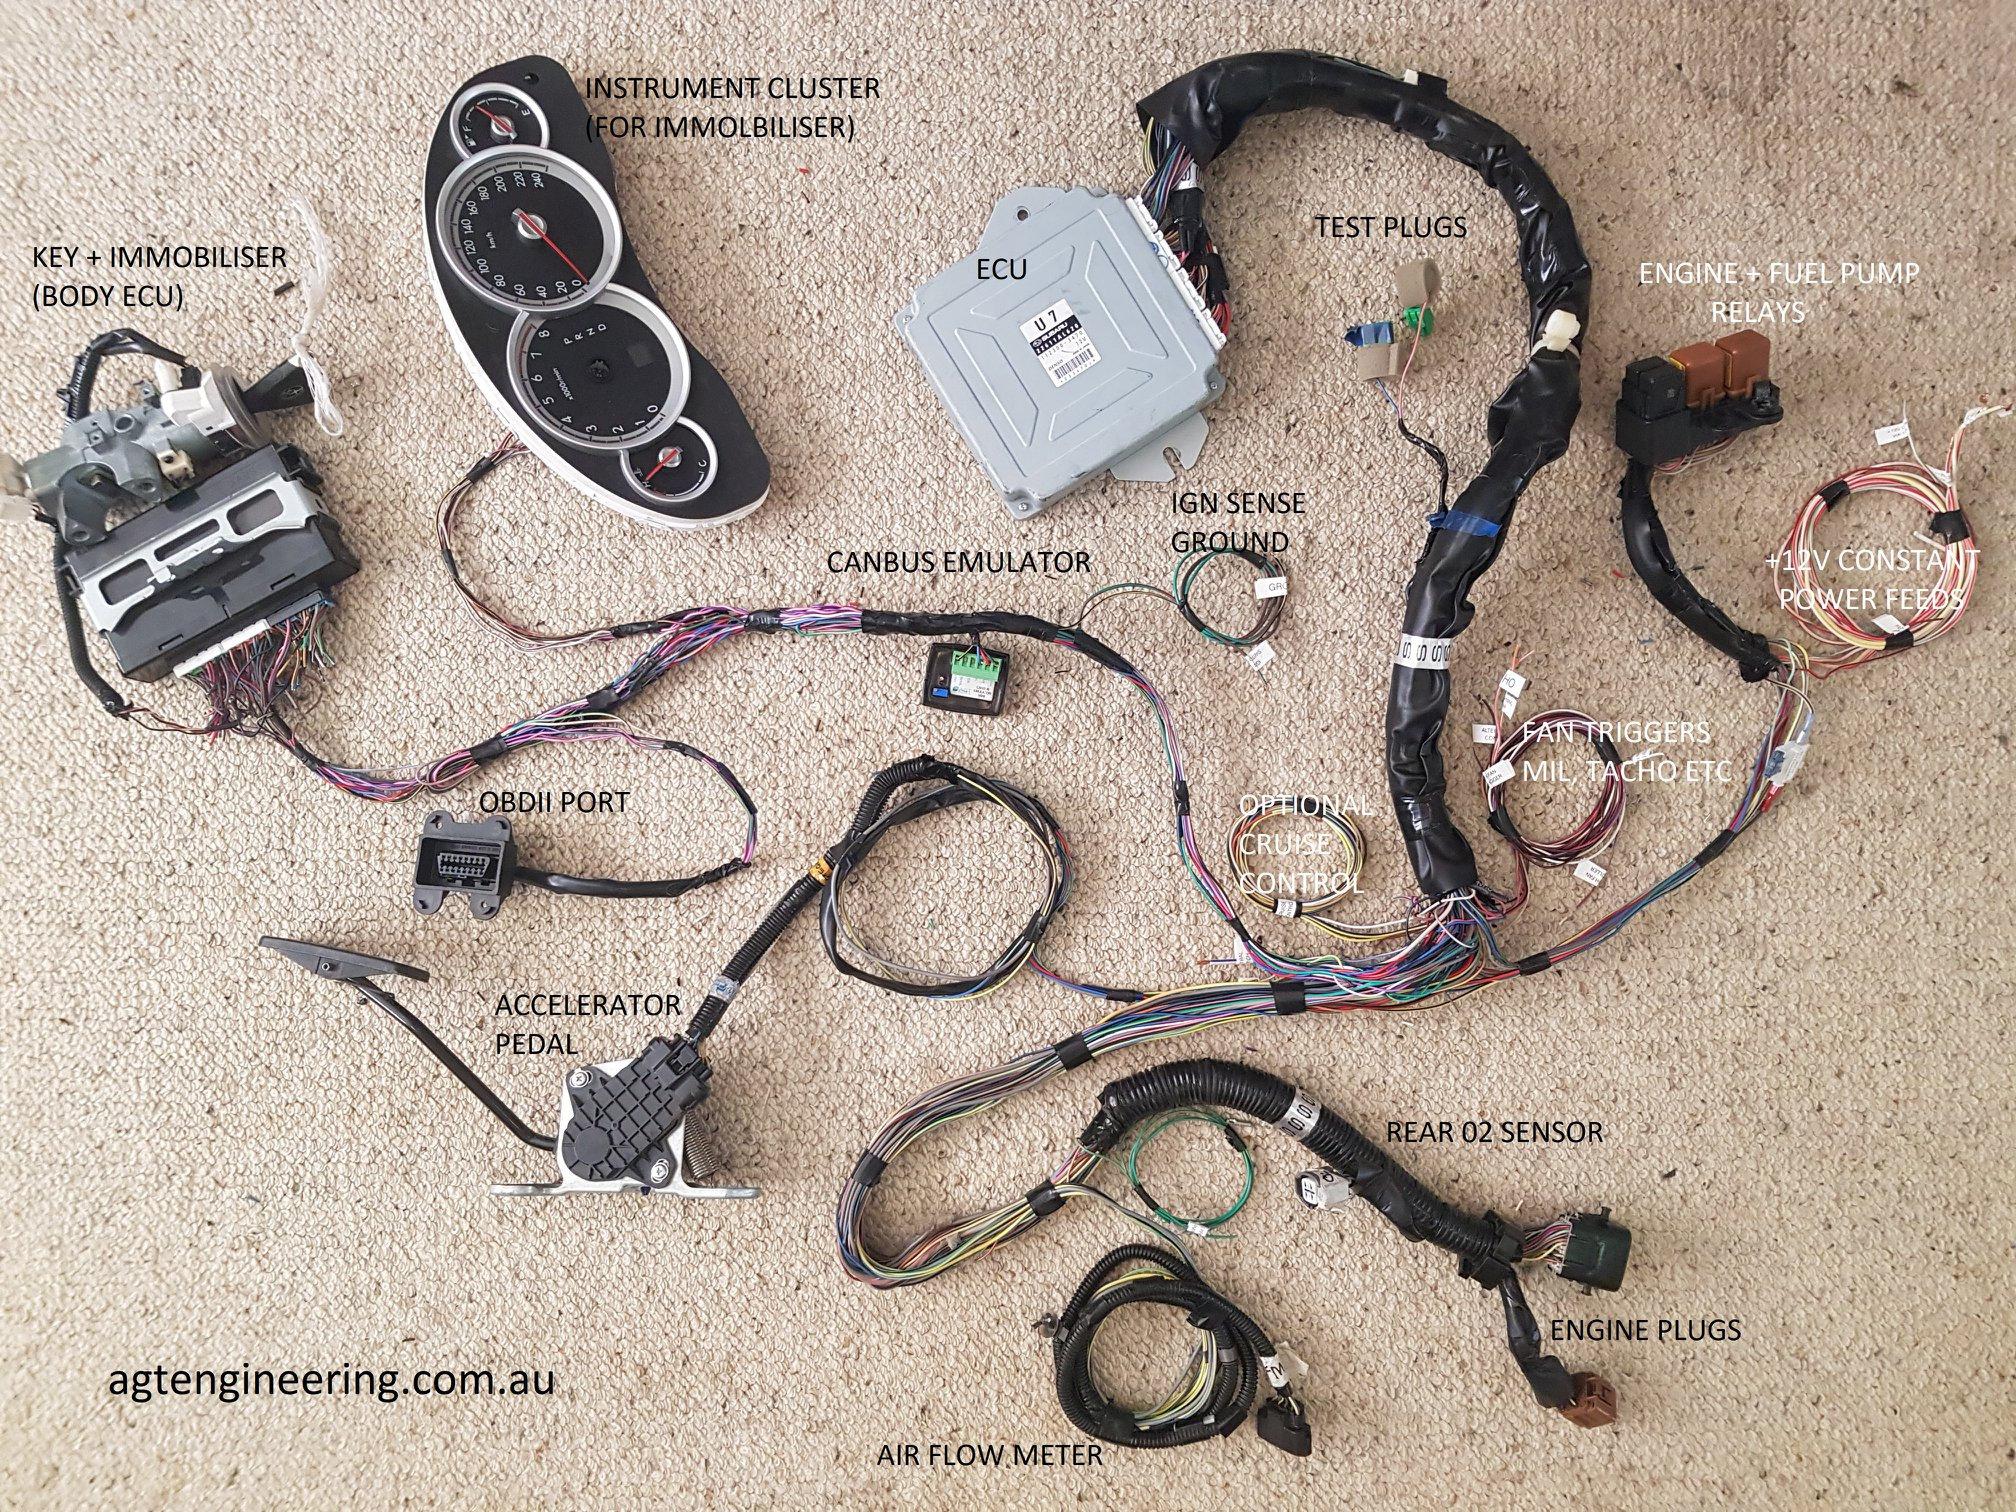 Basic Subaru Wiring Loom Conversion (Canbus Version) | AGT EngineeringAGT Engineering